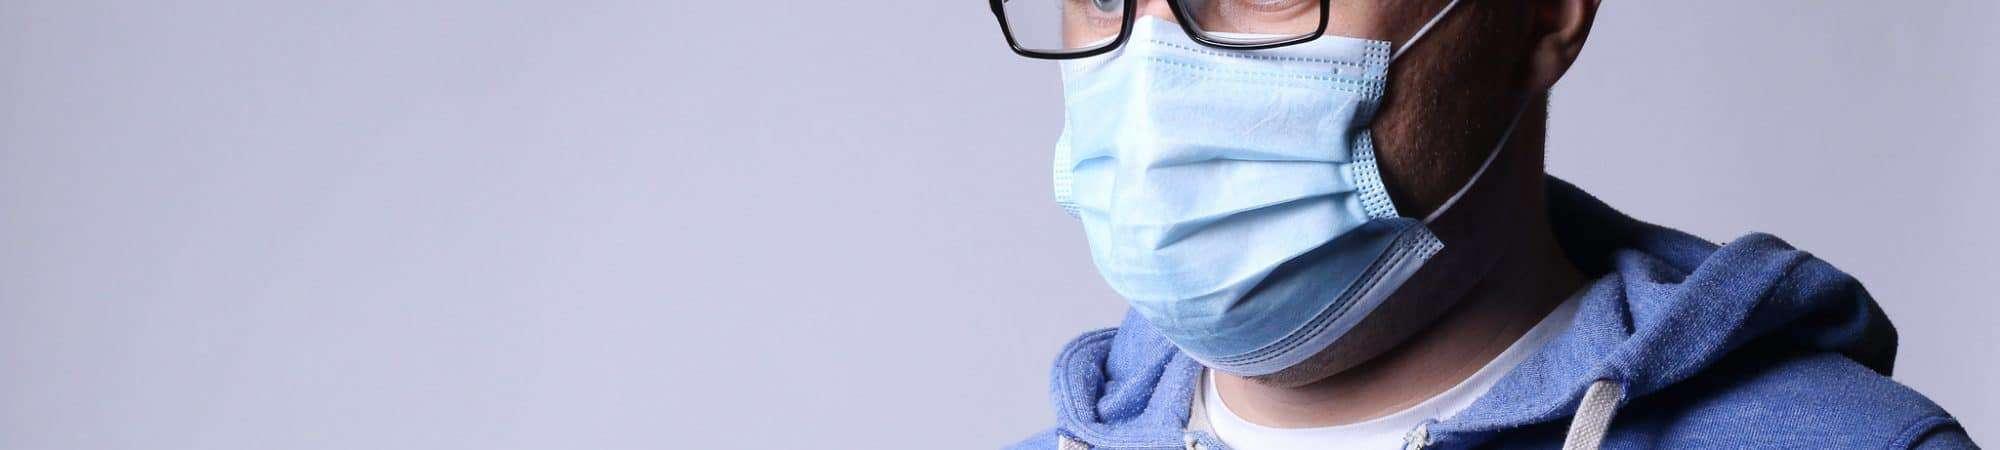 Homem de máscara e óculos